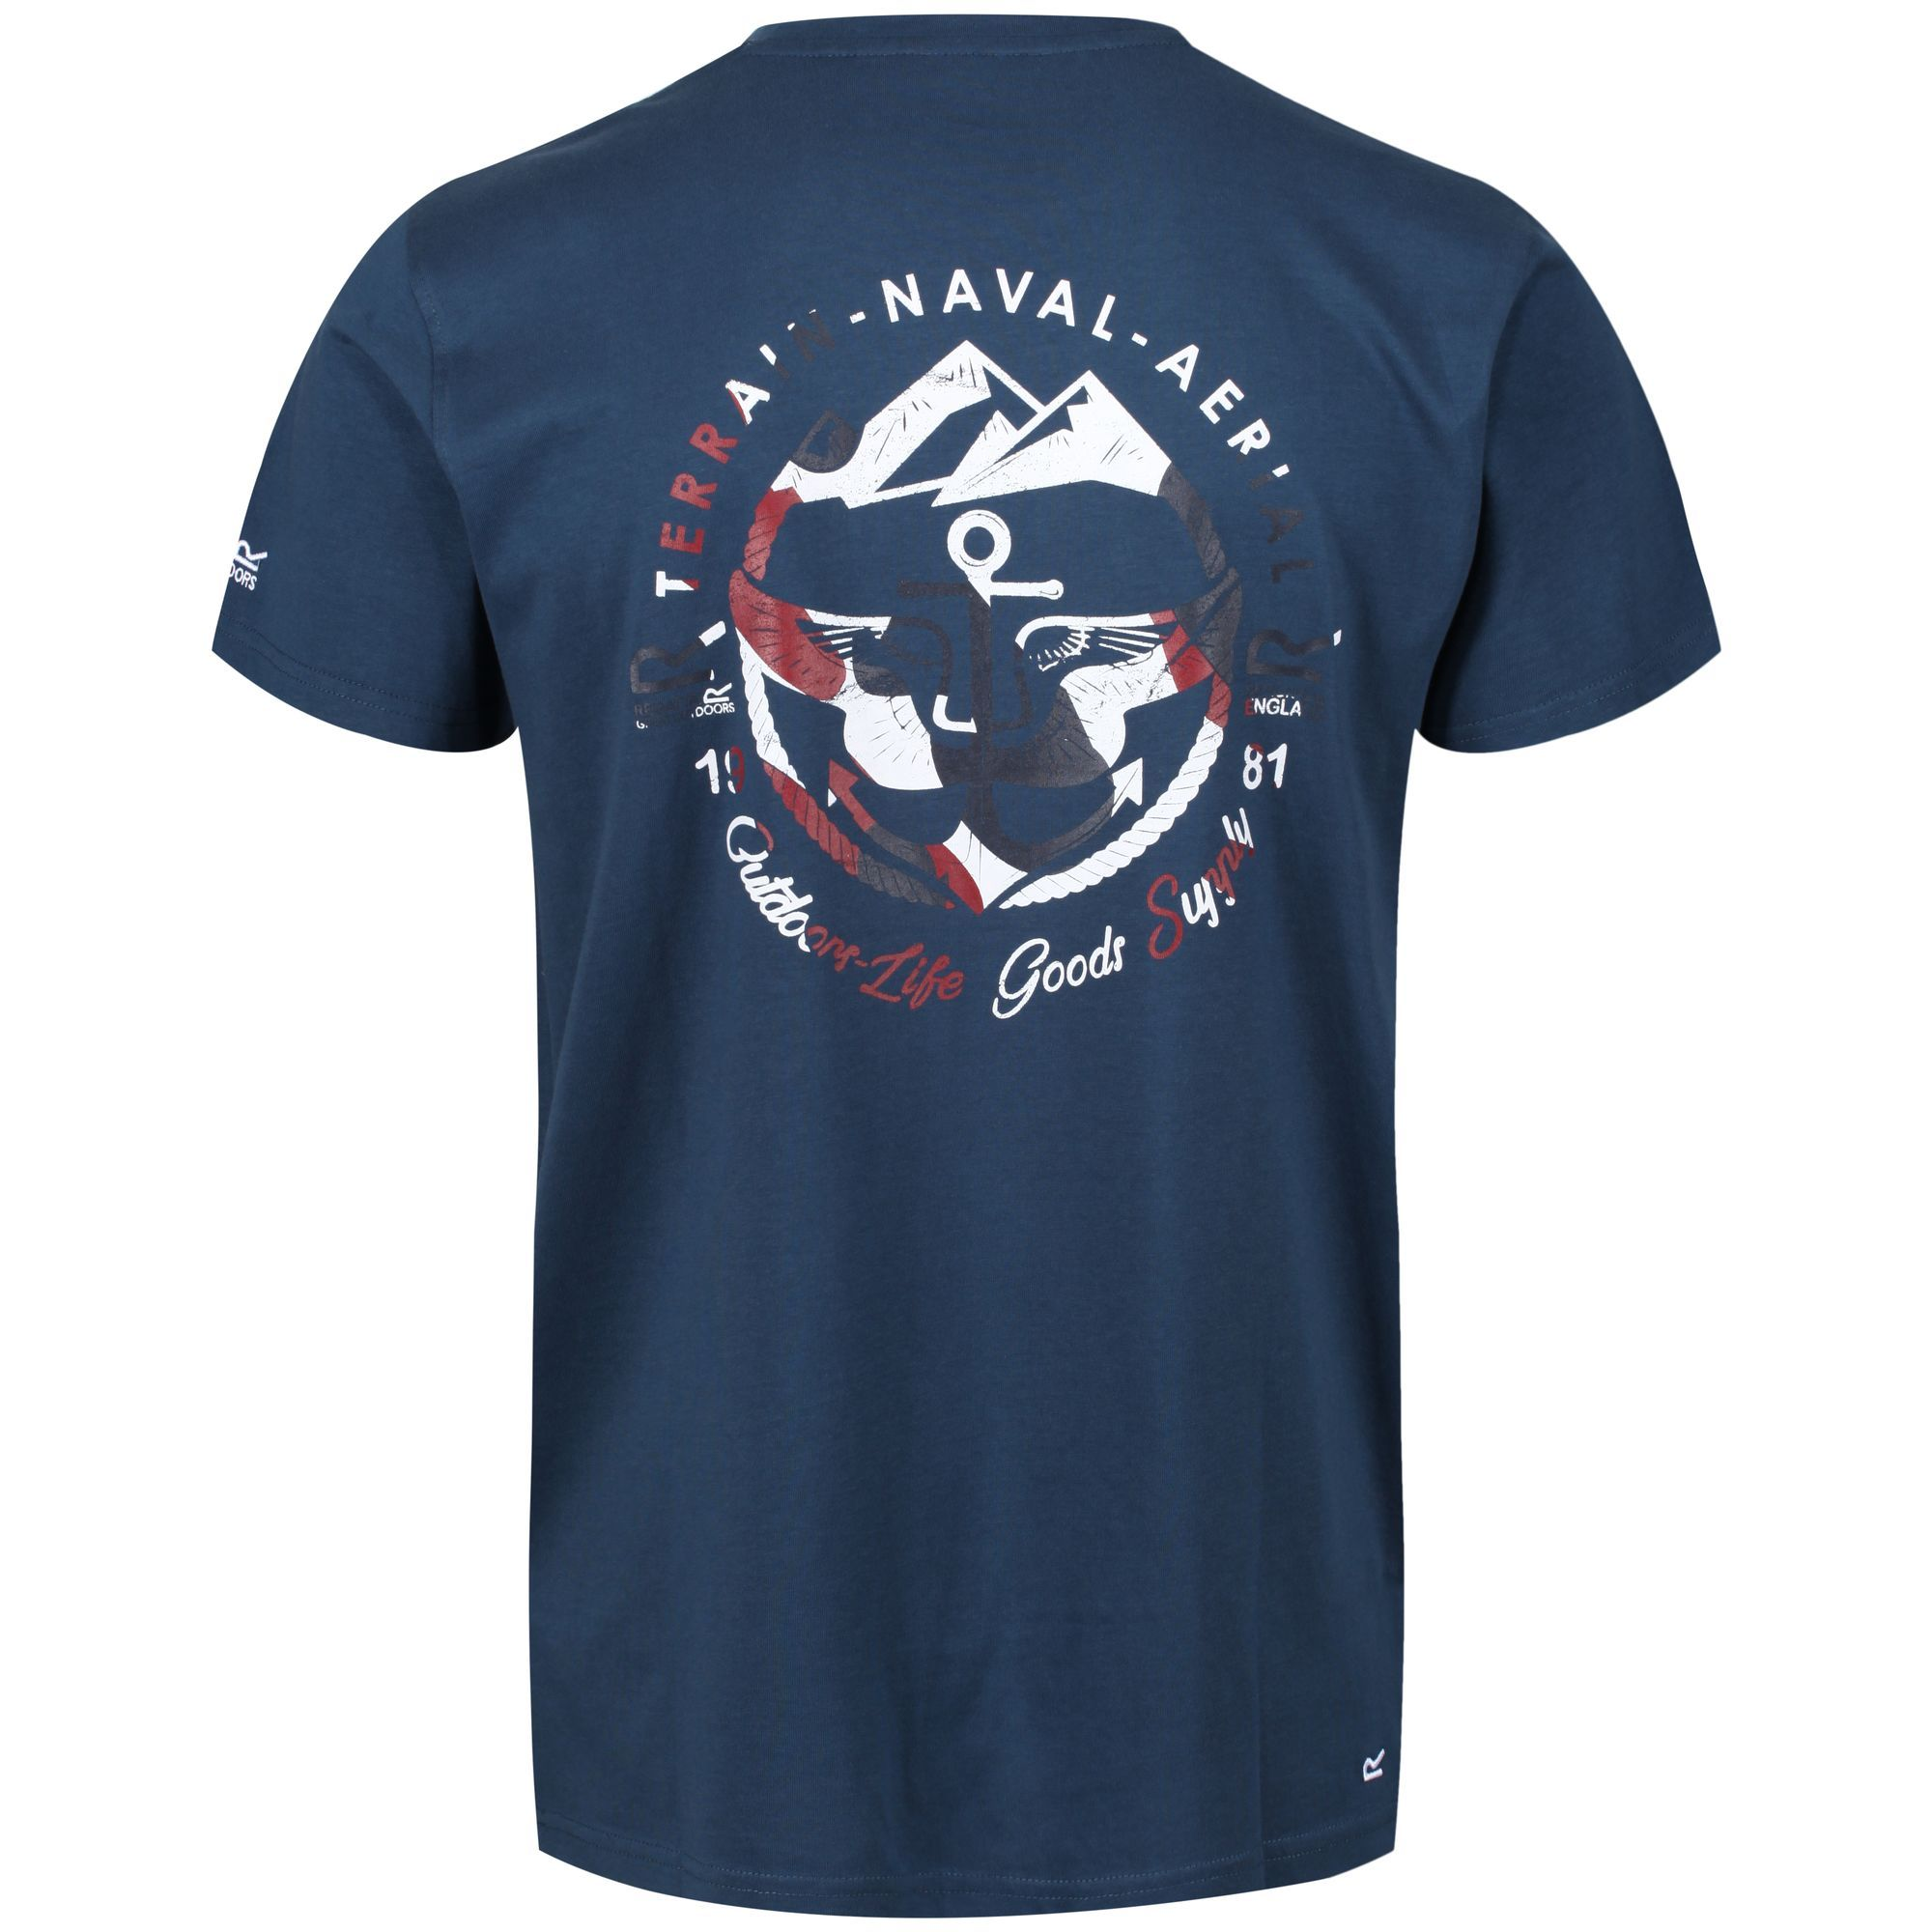 Regatta Mens Cline III Crew Neck Graphic Print T-Shirt